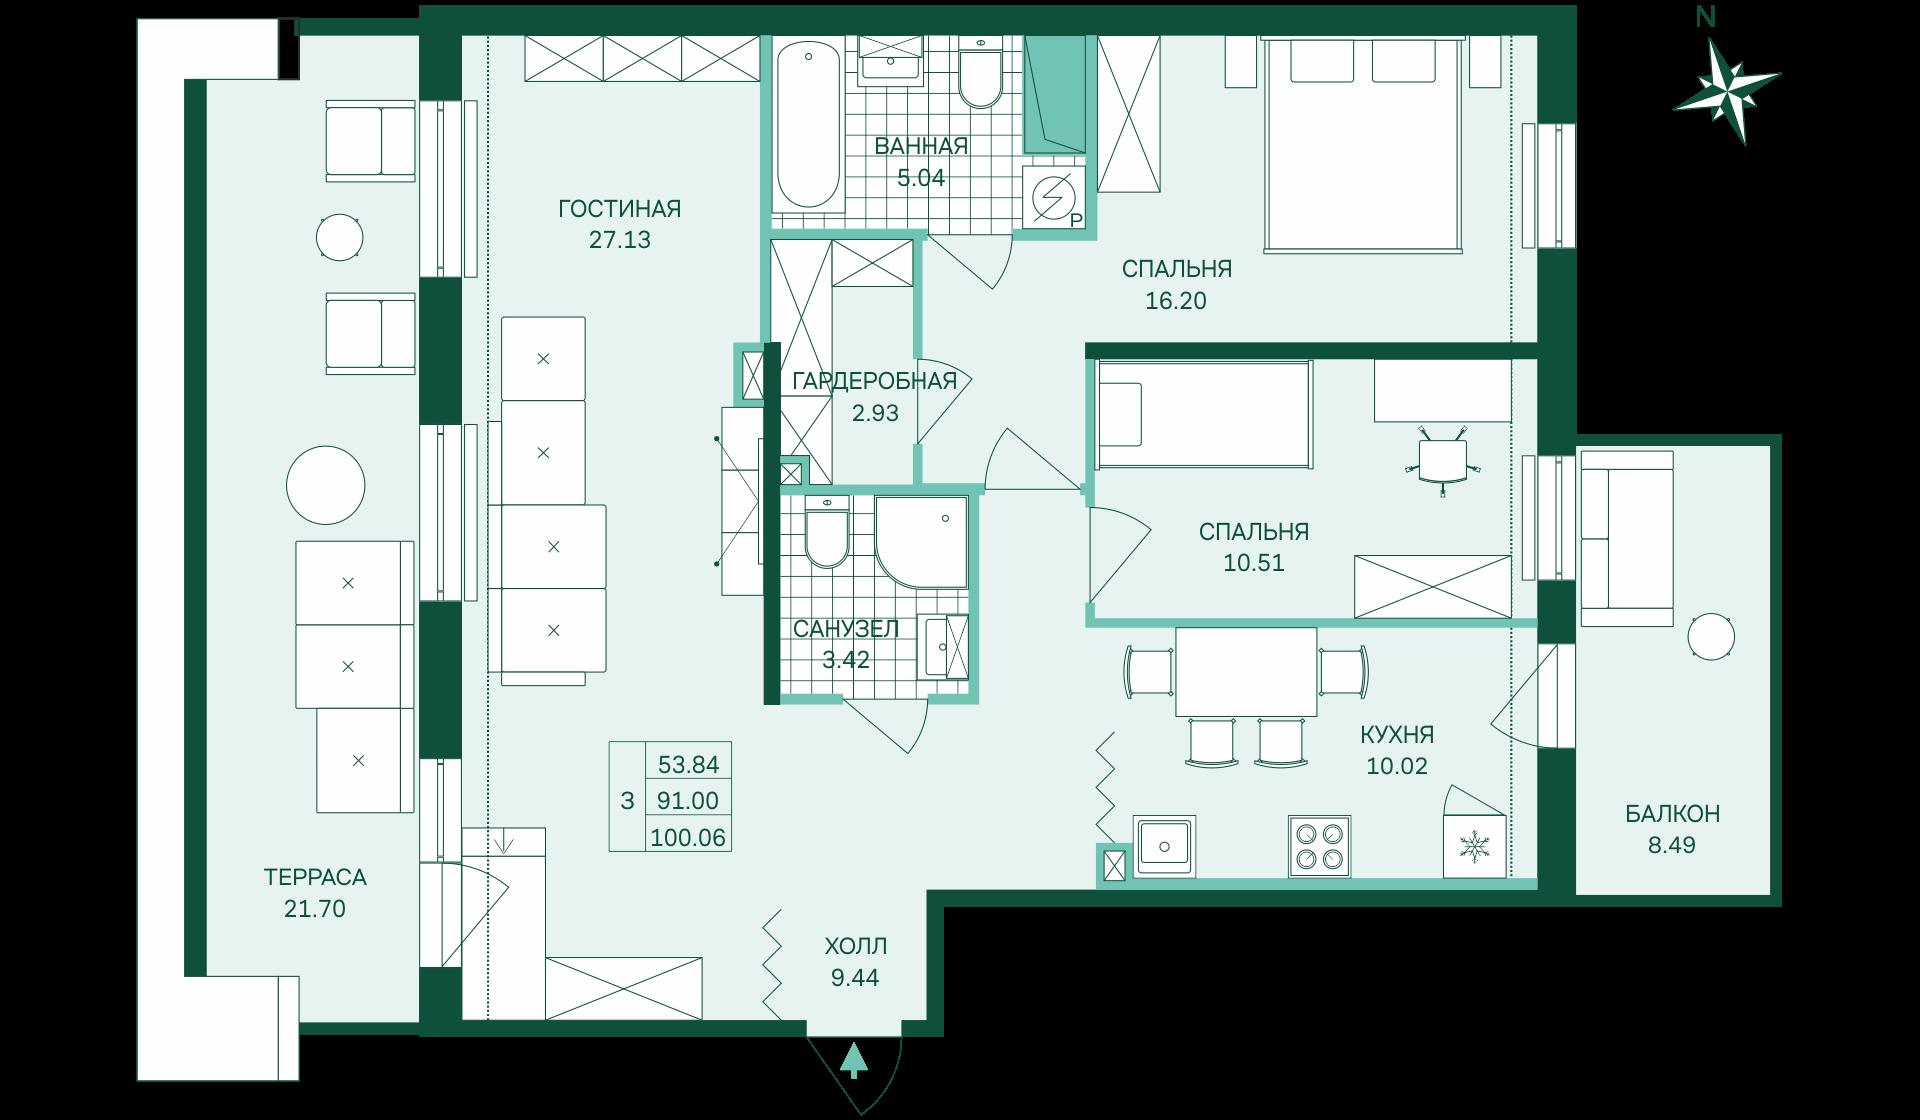 Планировка Трёхкомнатная квартира площадью 100.06 кв.м в ЖК «Skandi Klubb»